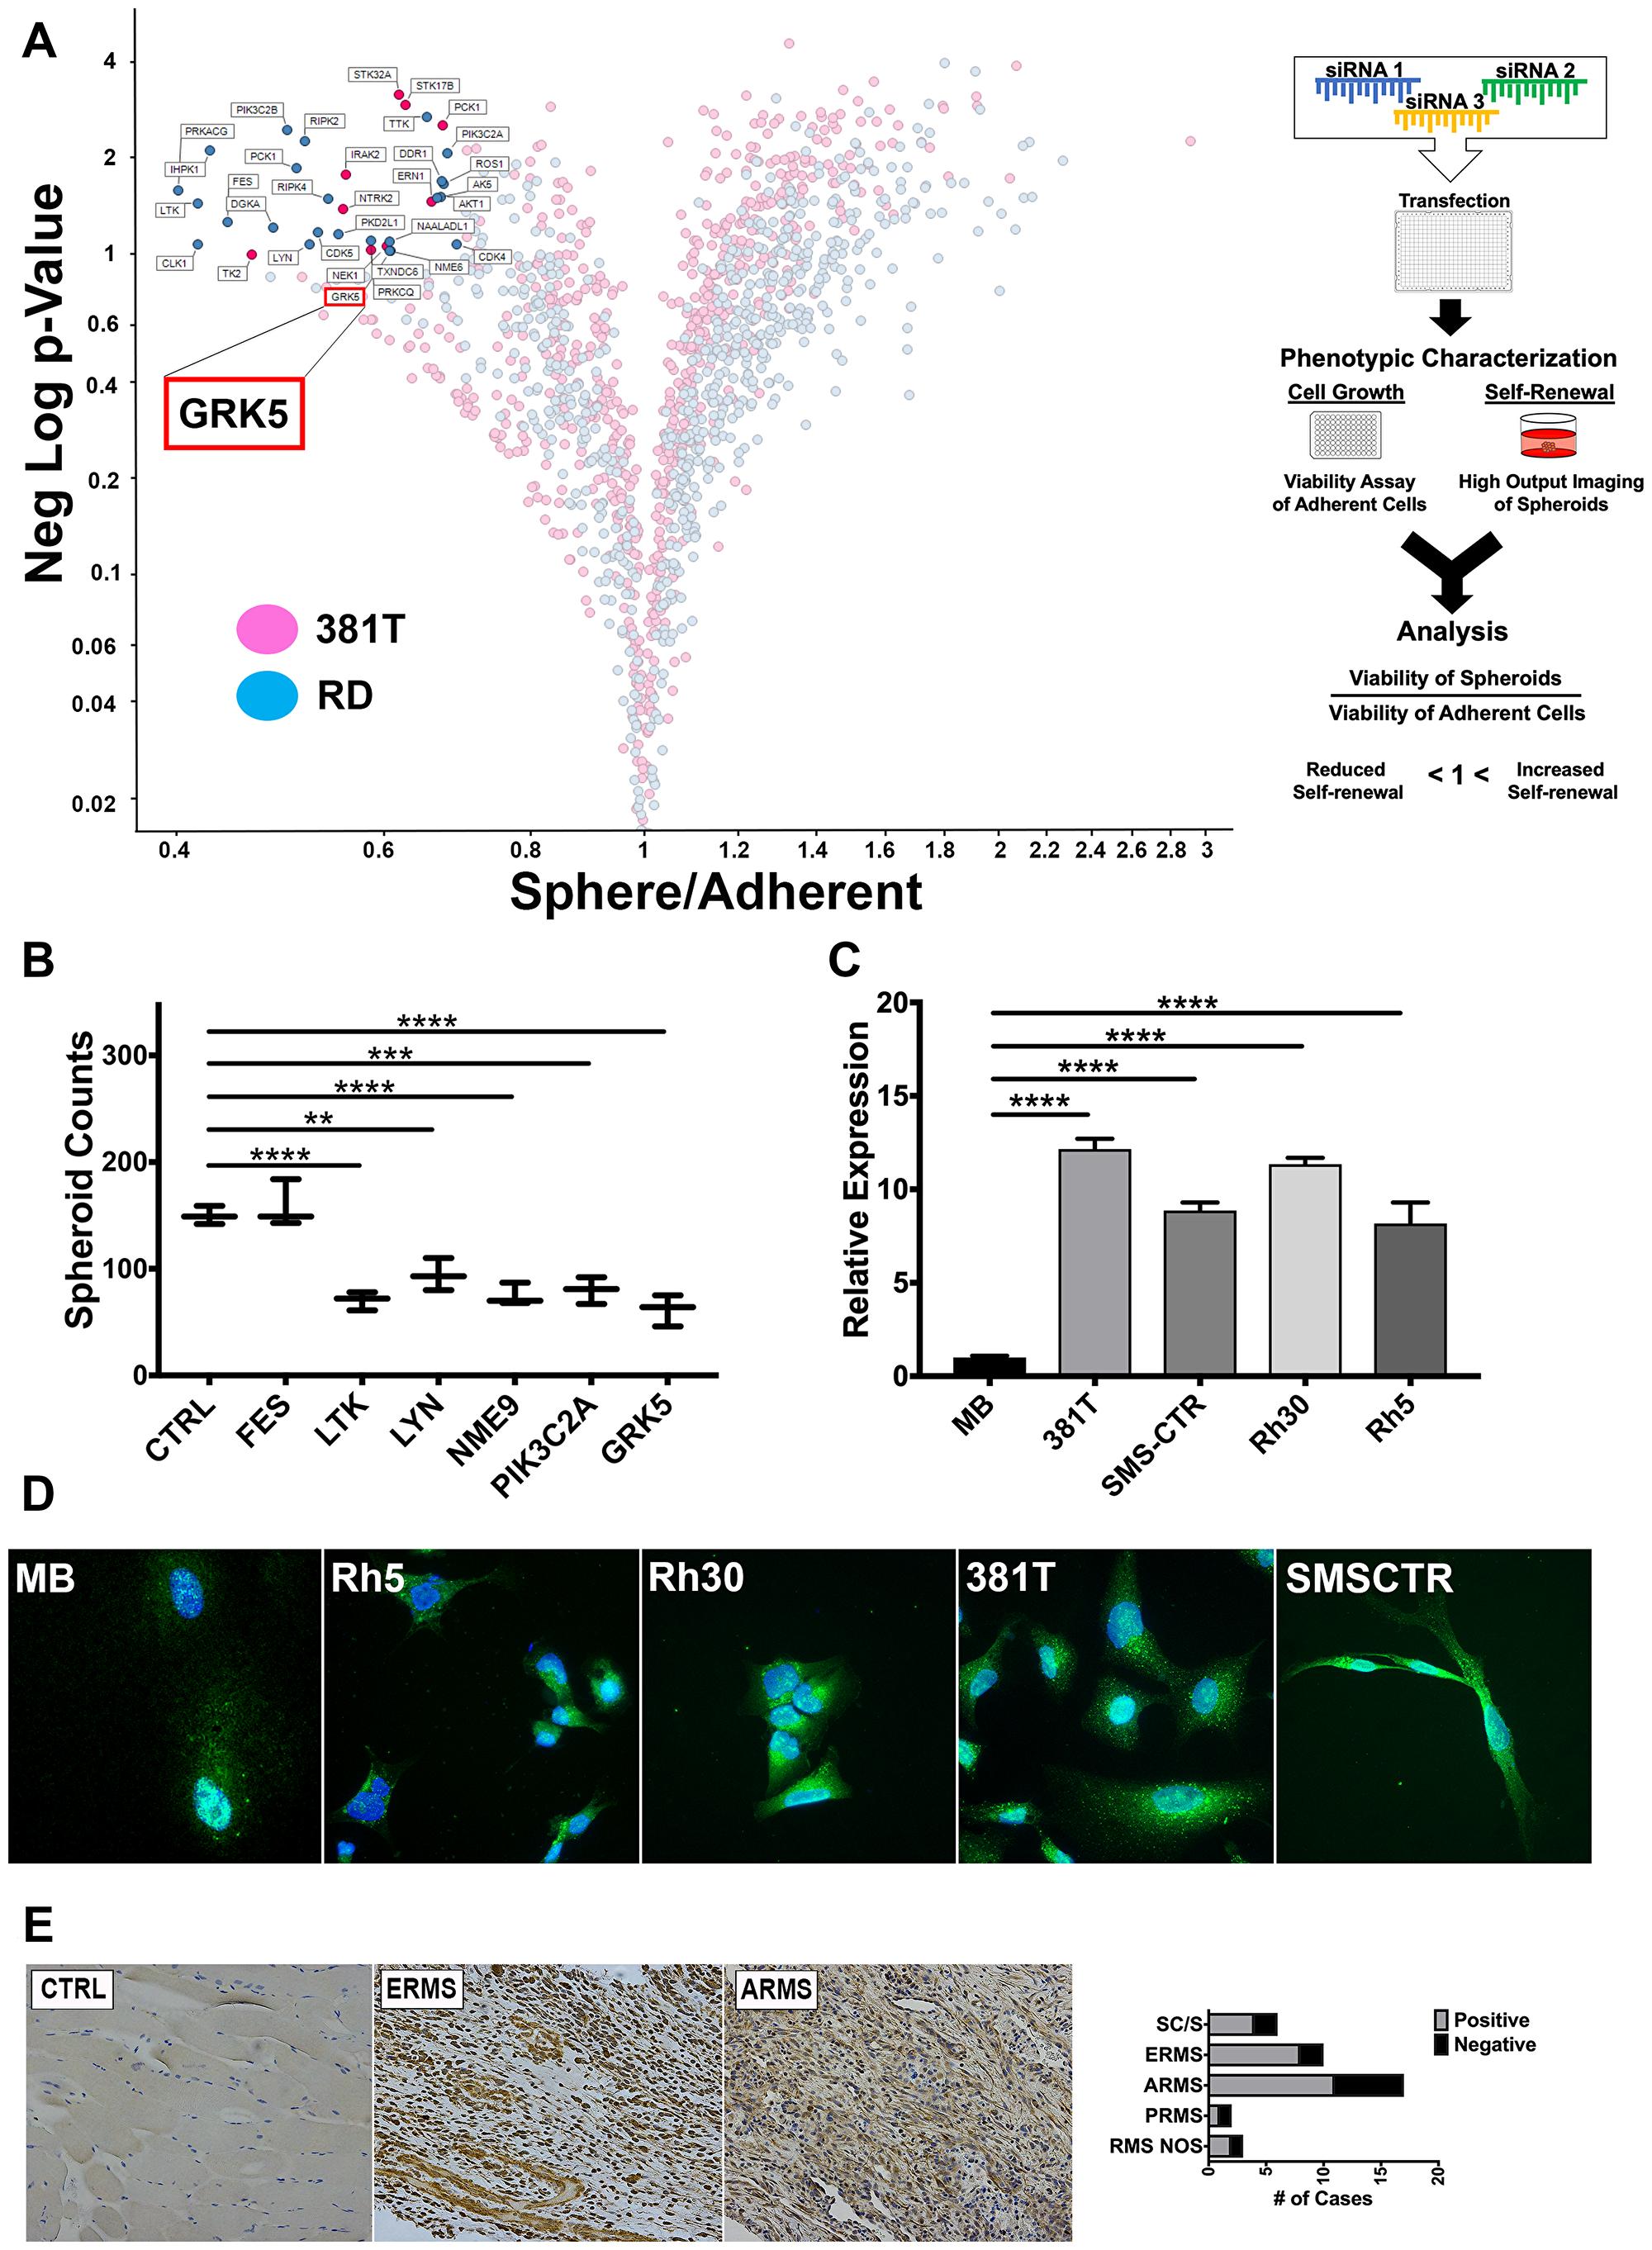 An siRNA library screen of the human kinome identifies GRK5 as a novel regulator of ERMS self-renewal.